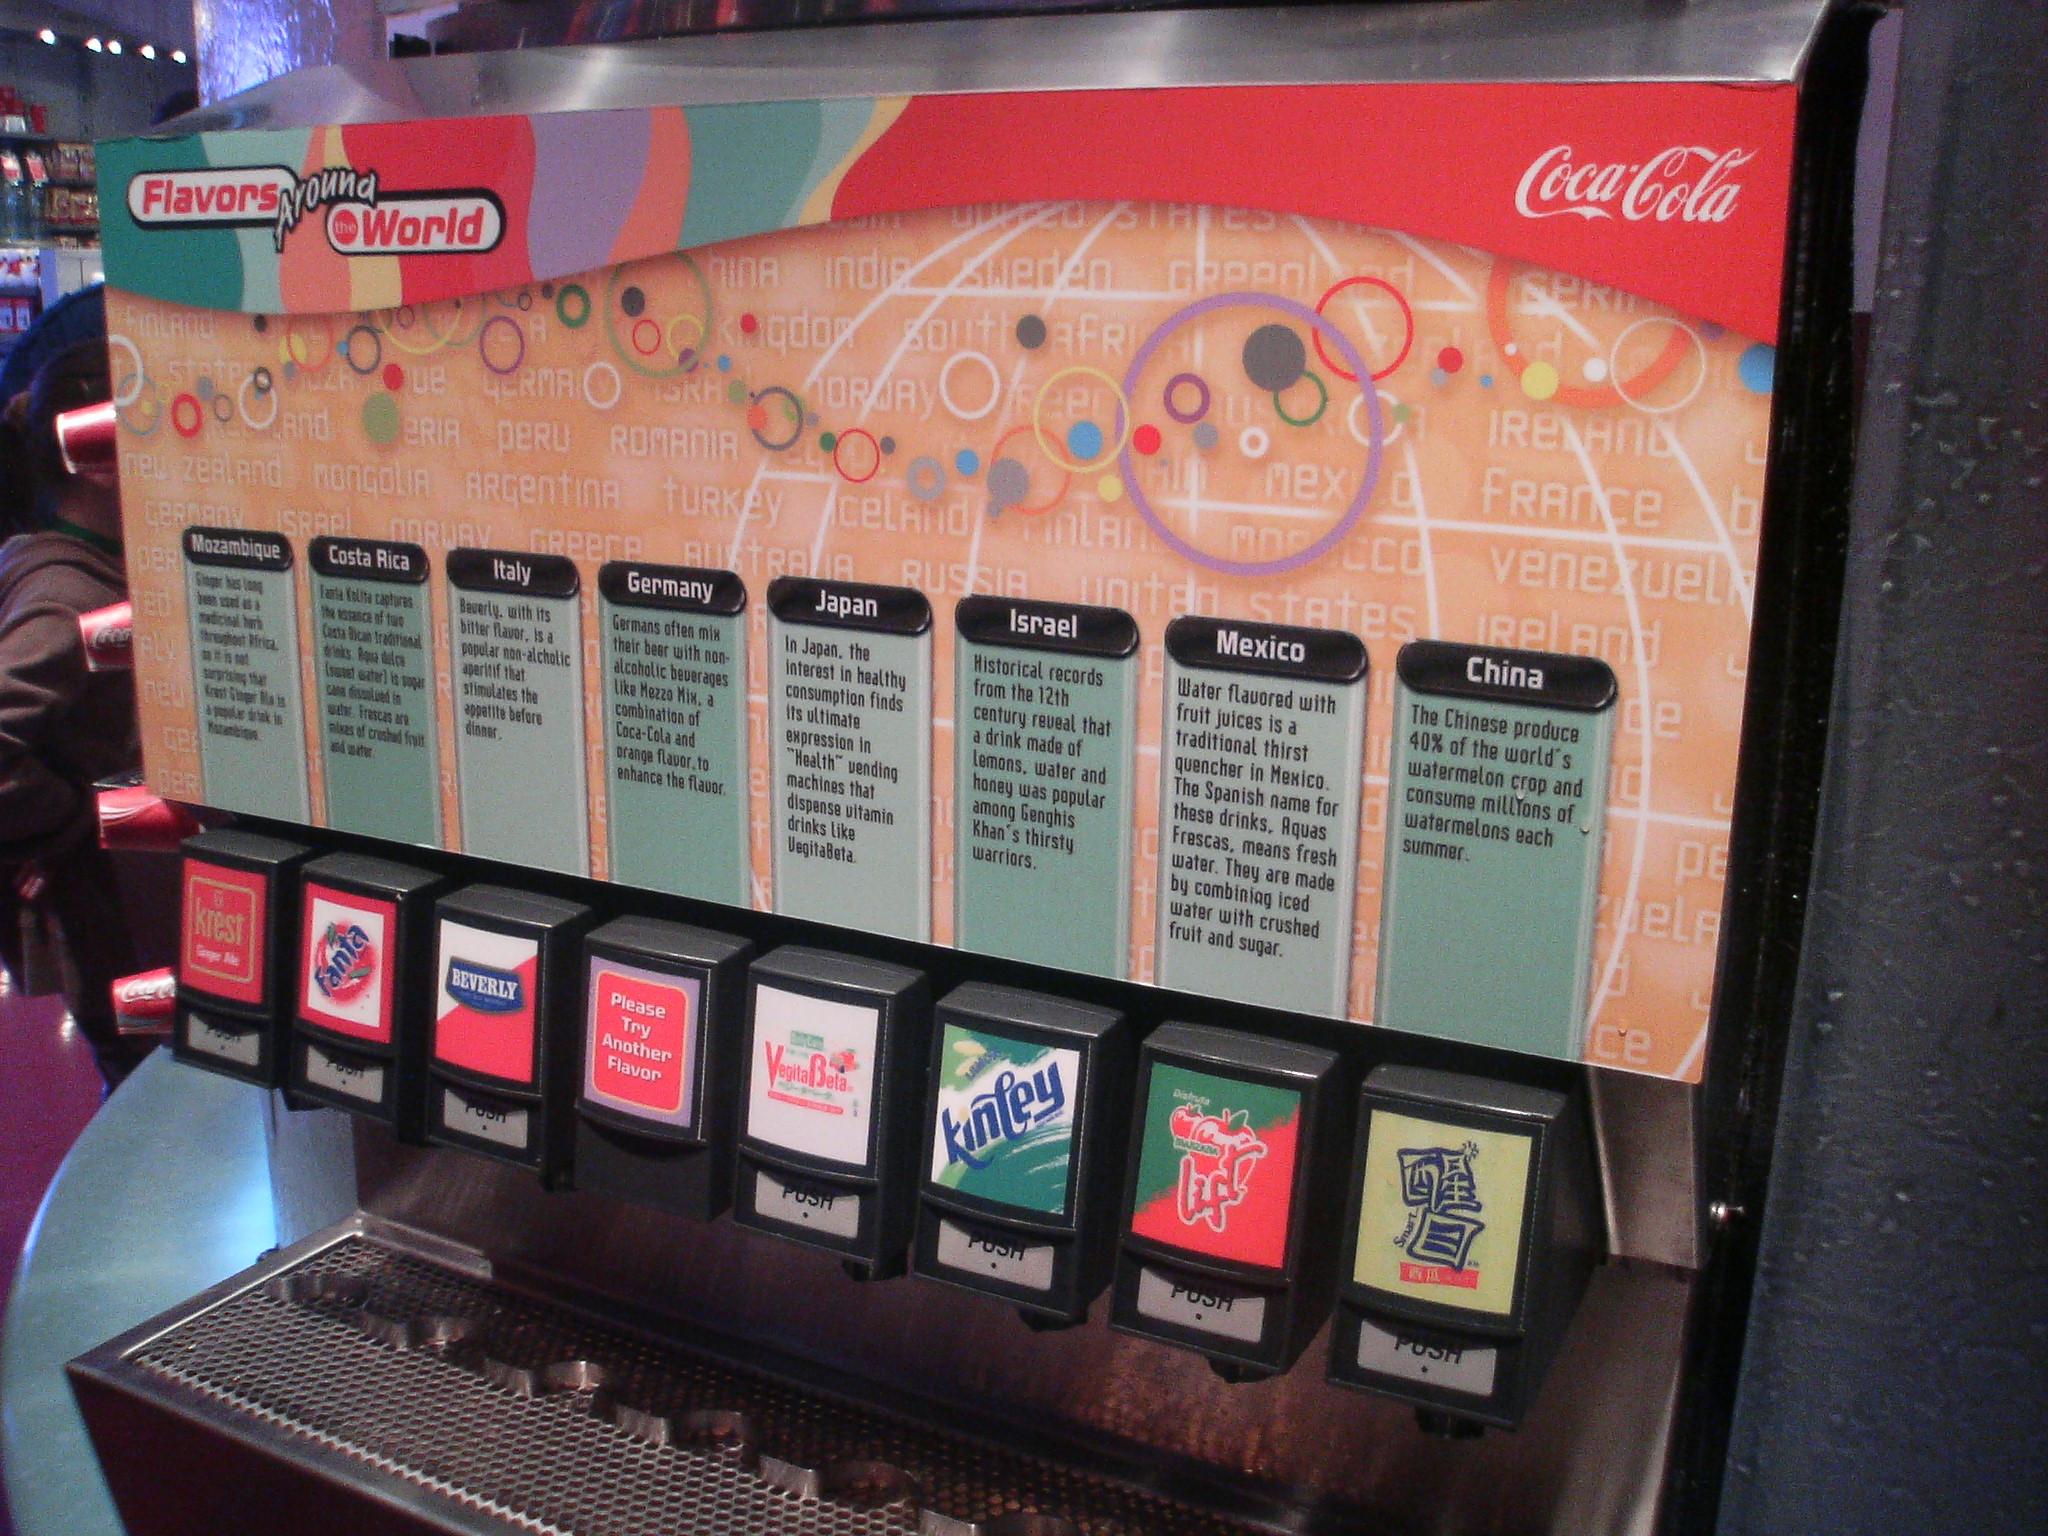 Coca-Cola soda machine at Disney World